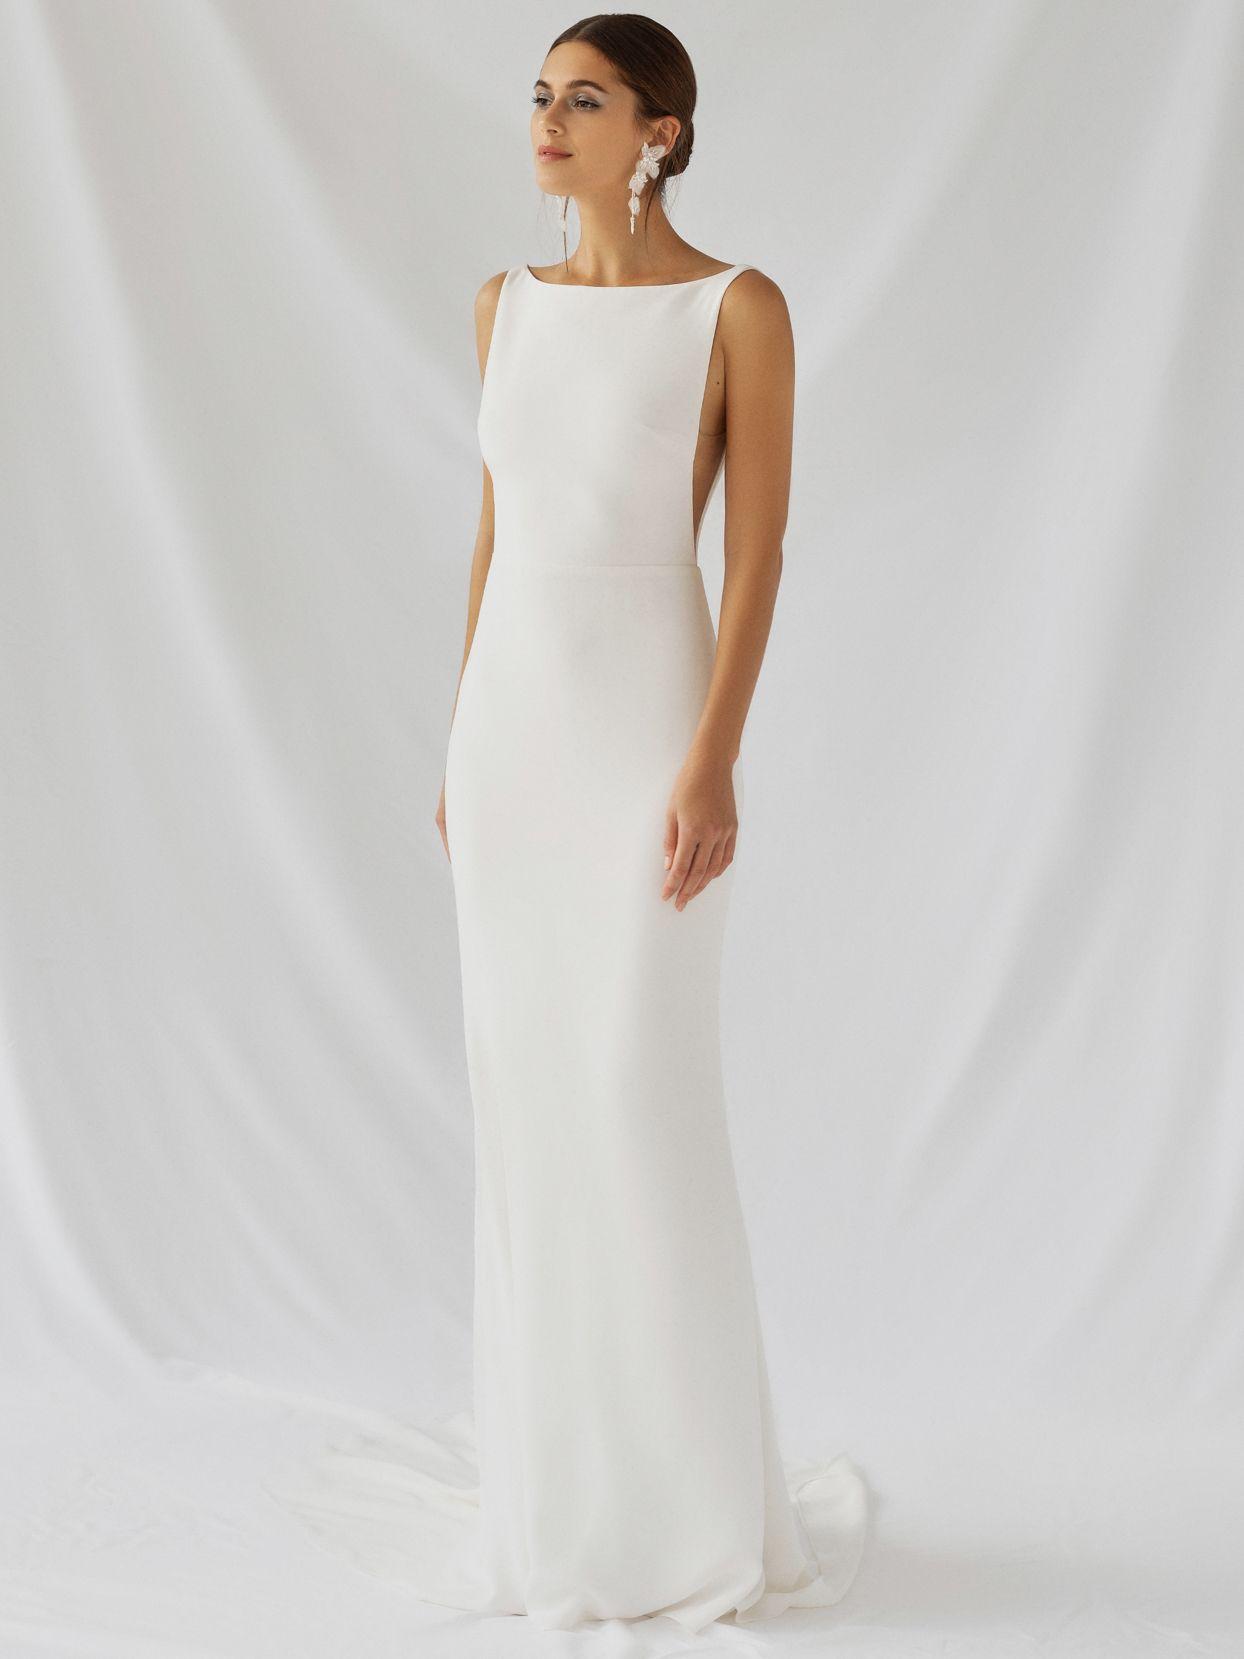 Alexandra Grecco Fall 2021 Wedding Dress Collection